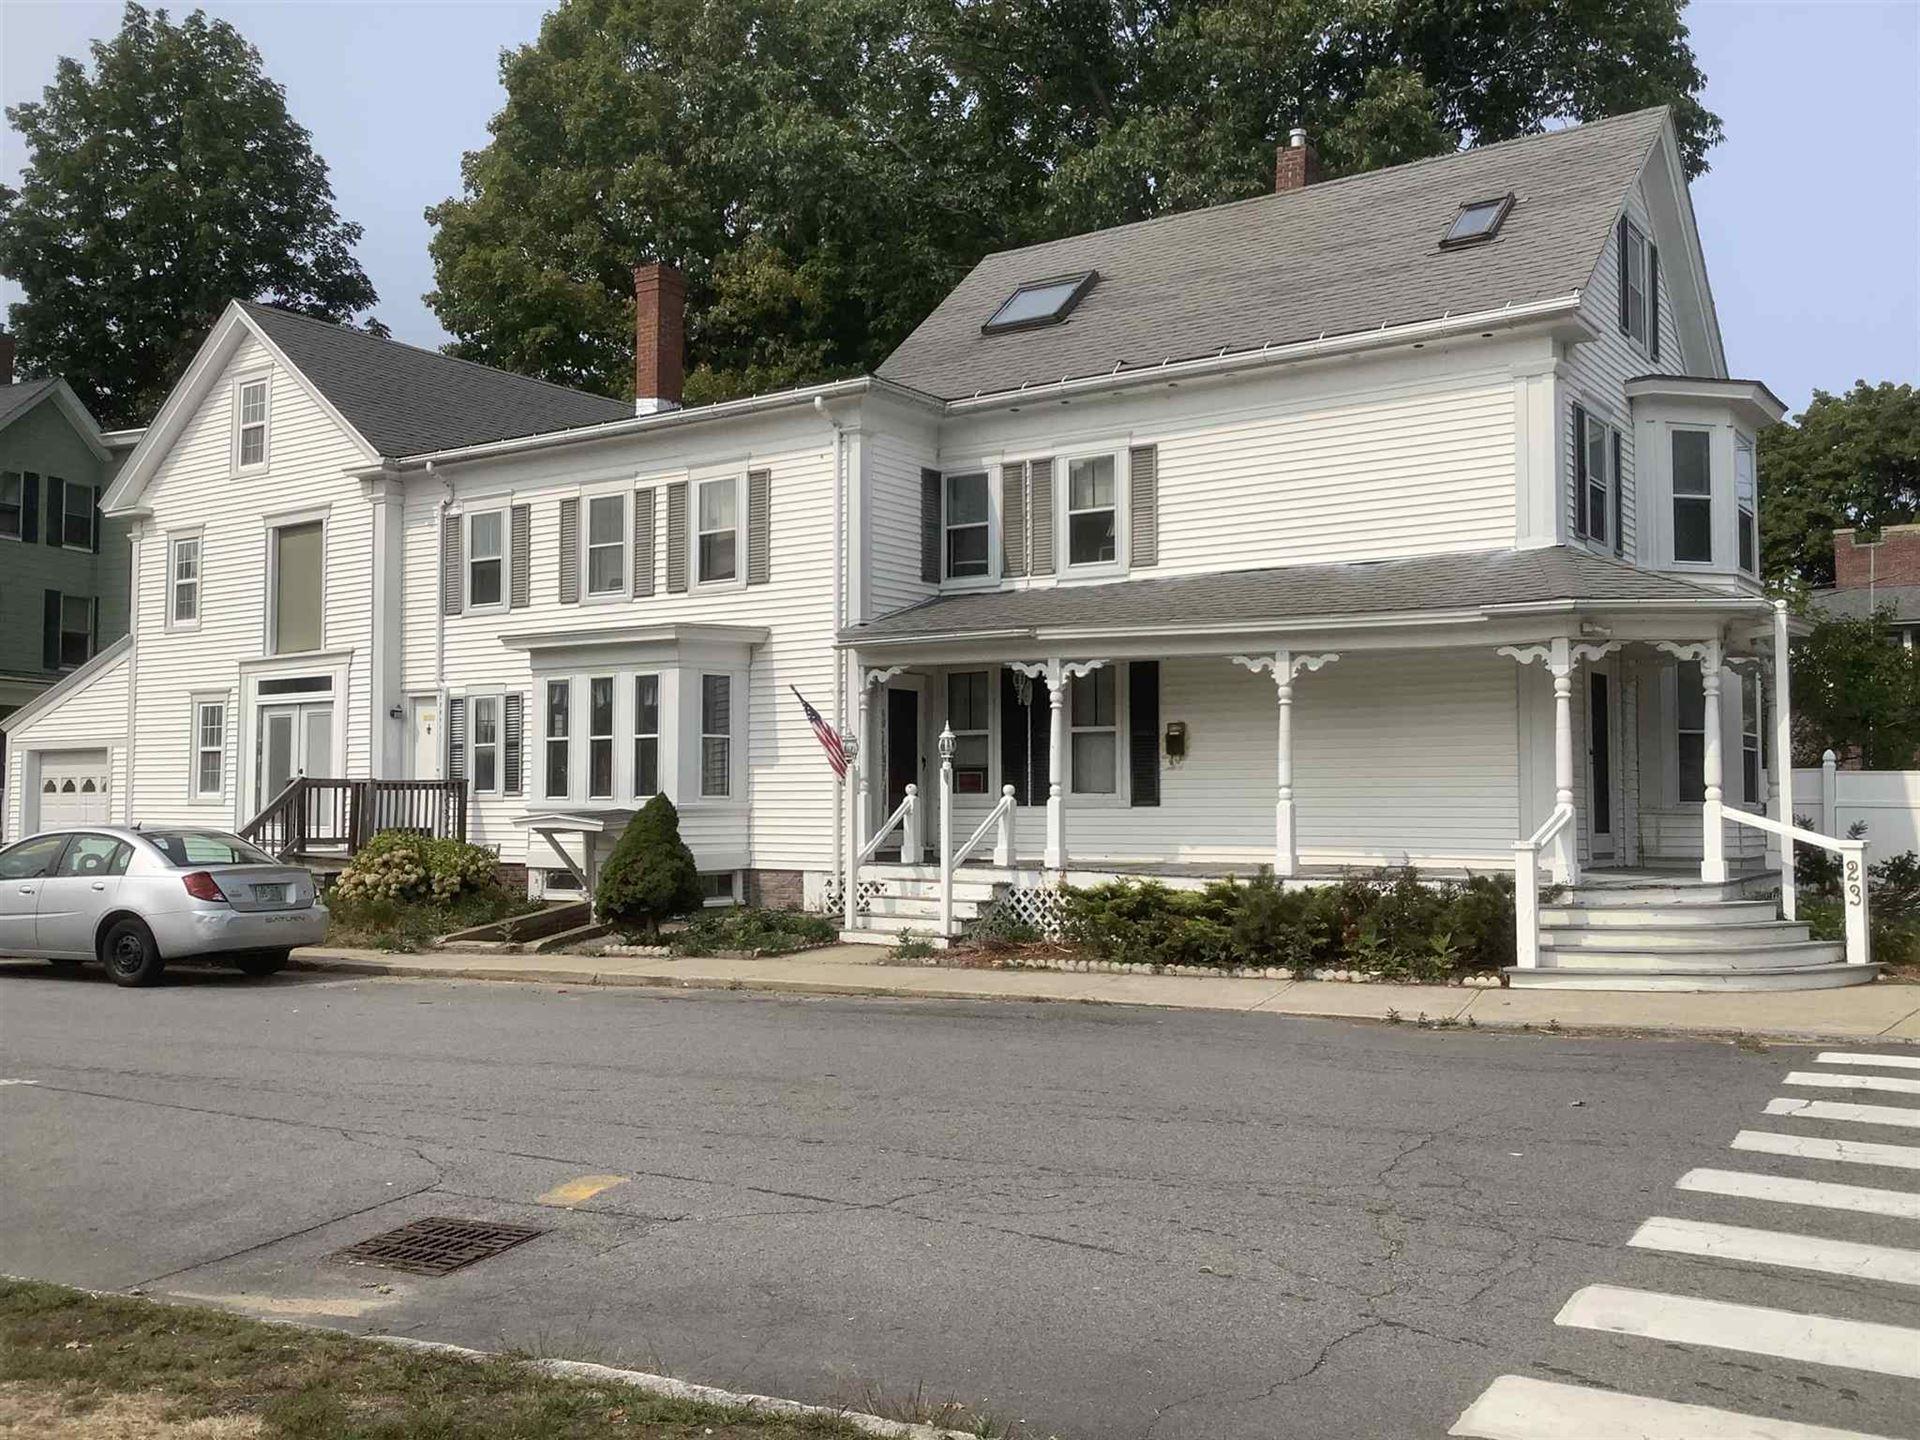 23 Charles Street, Rochester, NH 03867 - MLS#: 4828991